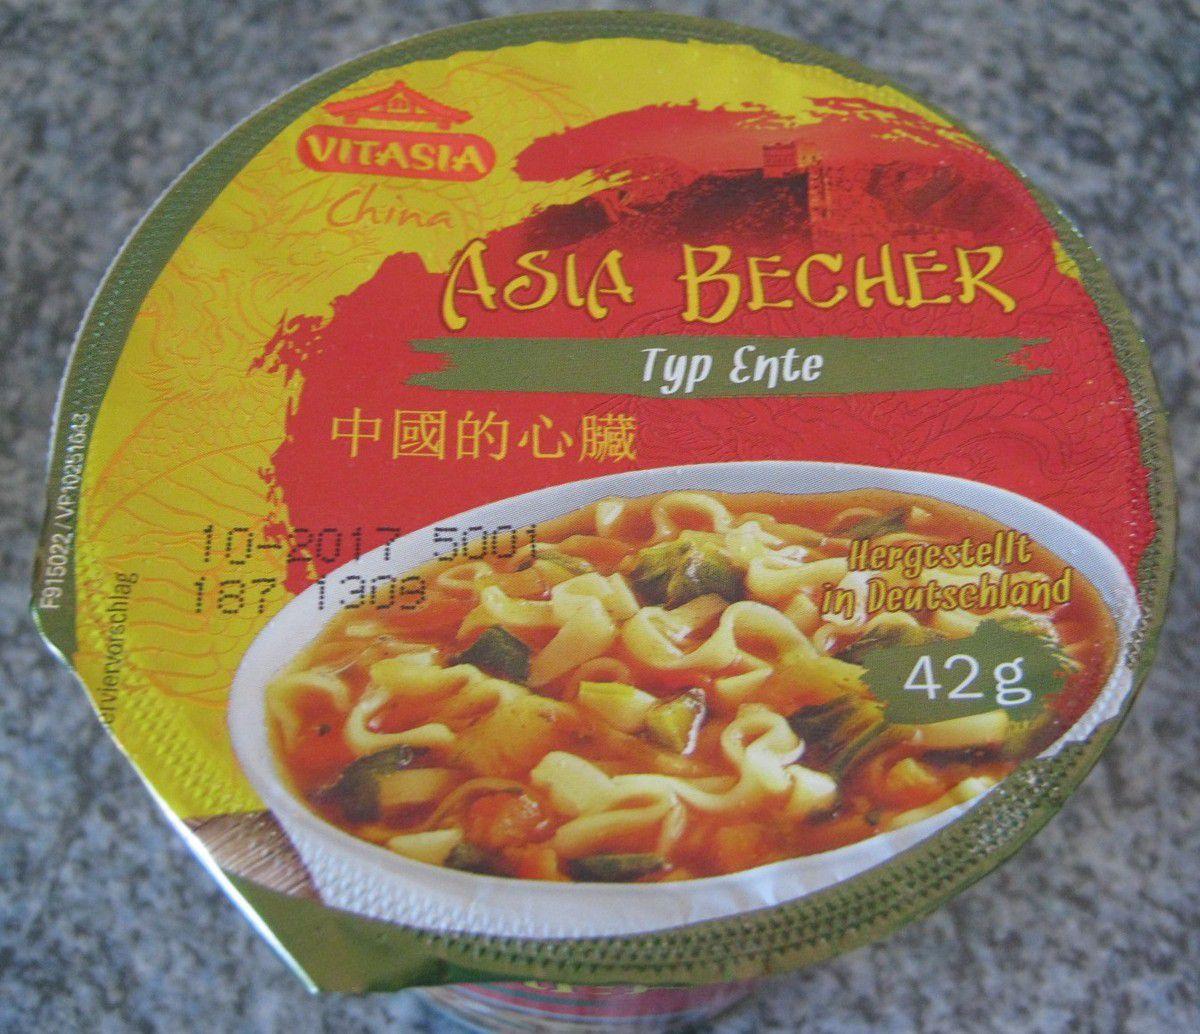 [Lidl] Vitasia Asia Becher Typ Ente (China) von Zamek Lebensmittelwerke